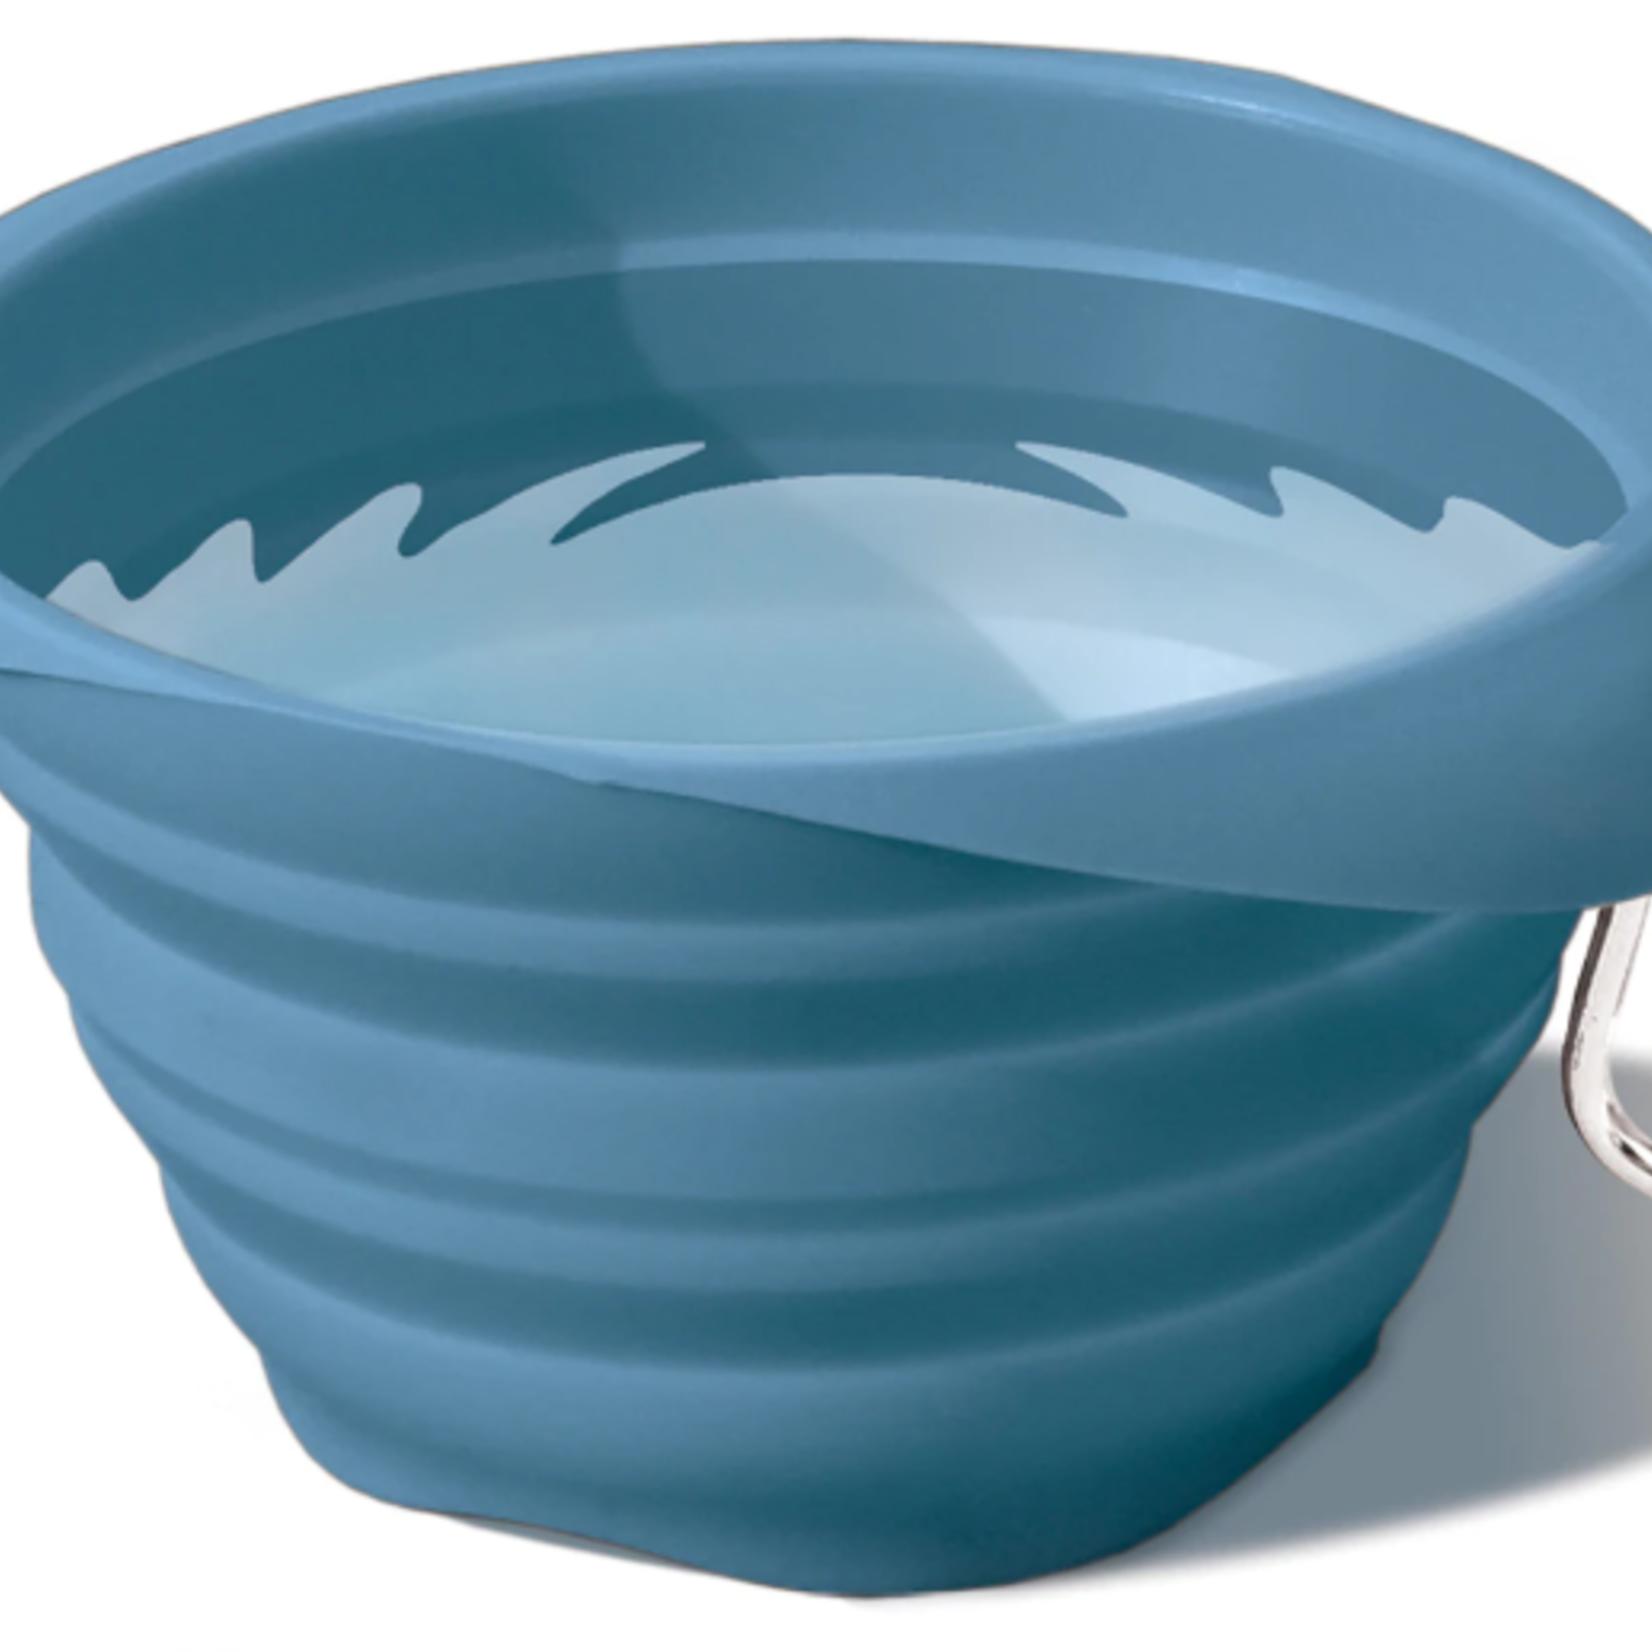 Kurgo Kurgo Collapsable Bowl Blue